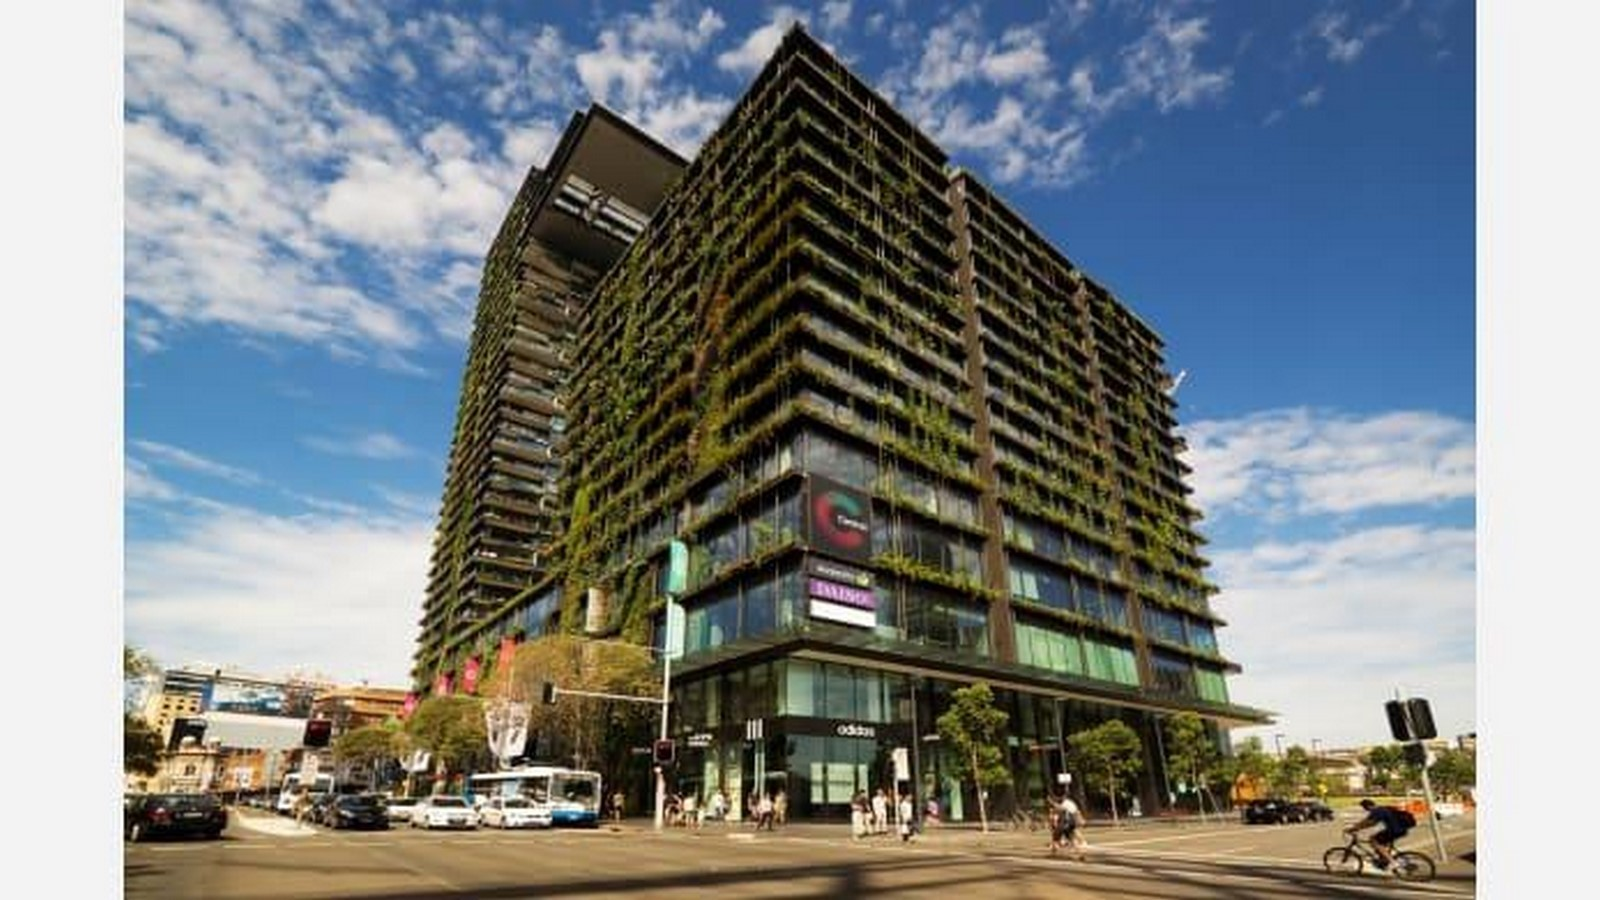 Eco architecture - Sheet1